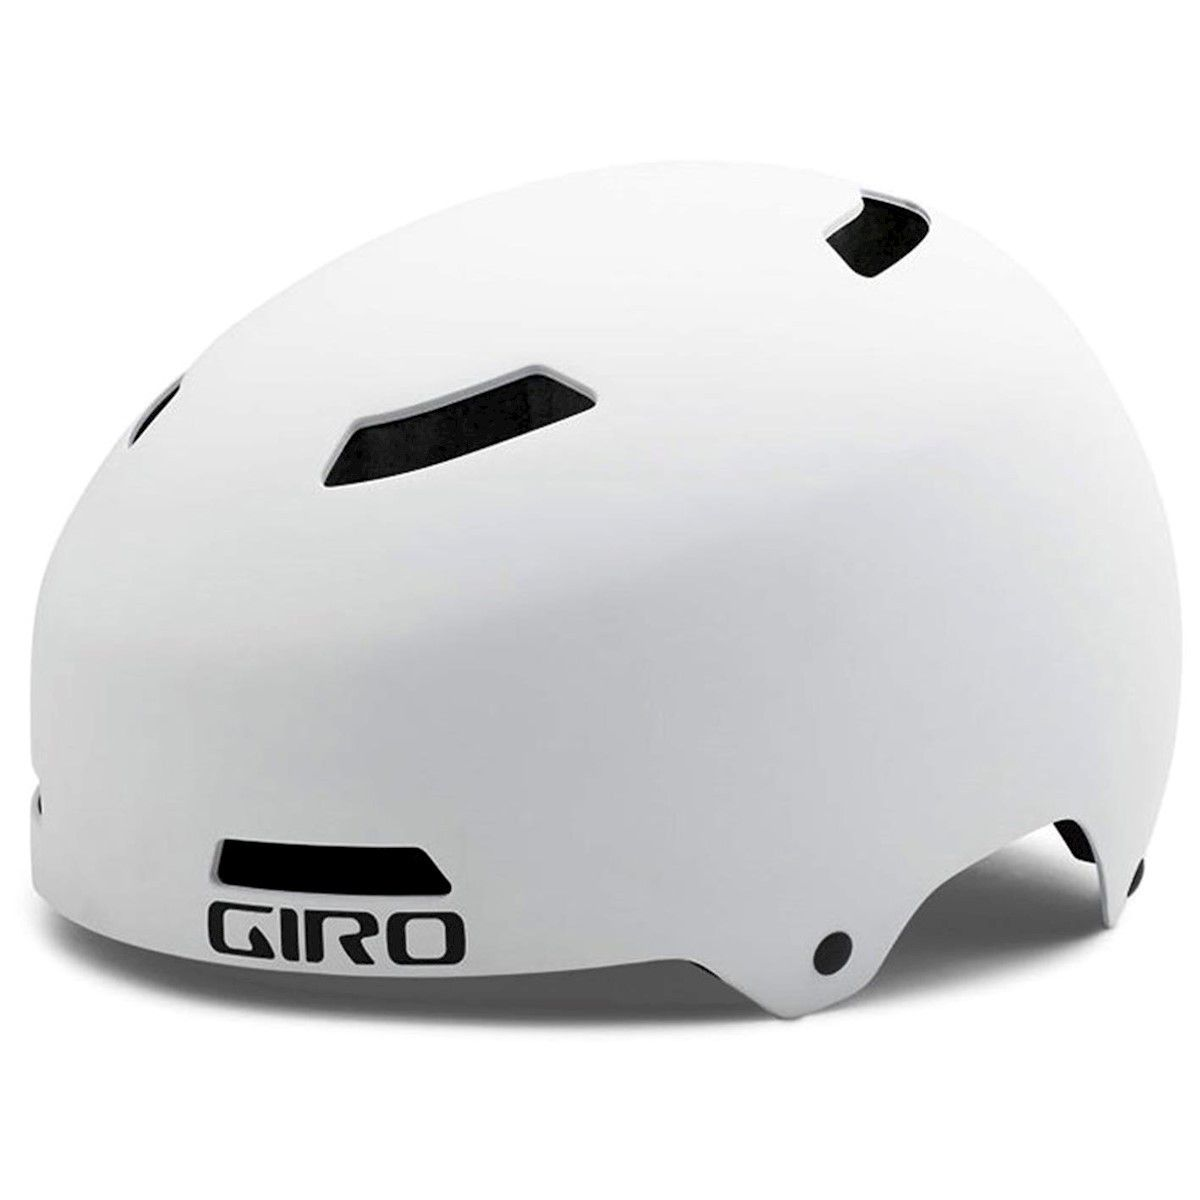 Capacete GIRO Quarter para BMX Skate Patins Roller Freestyle